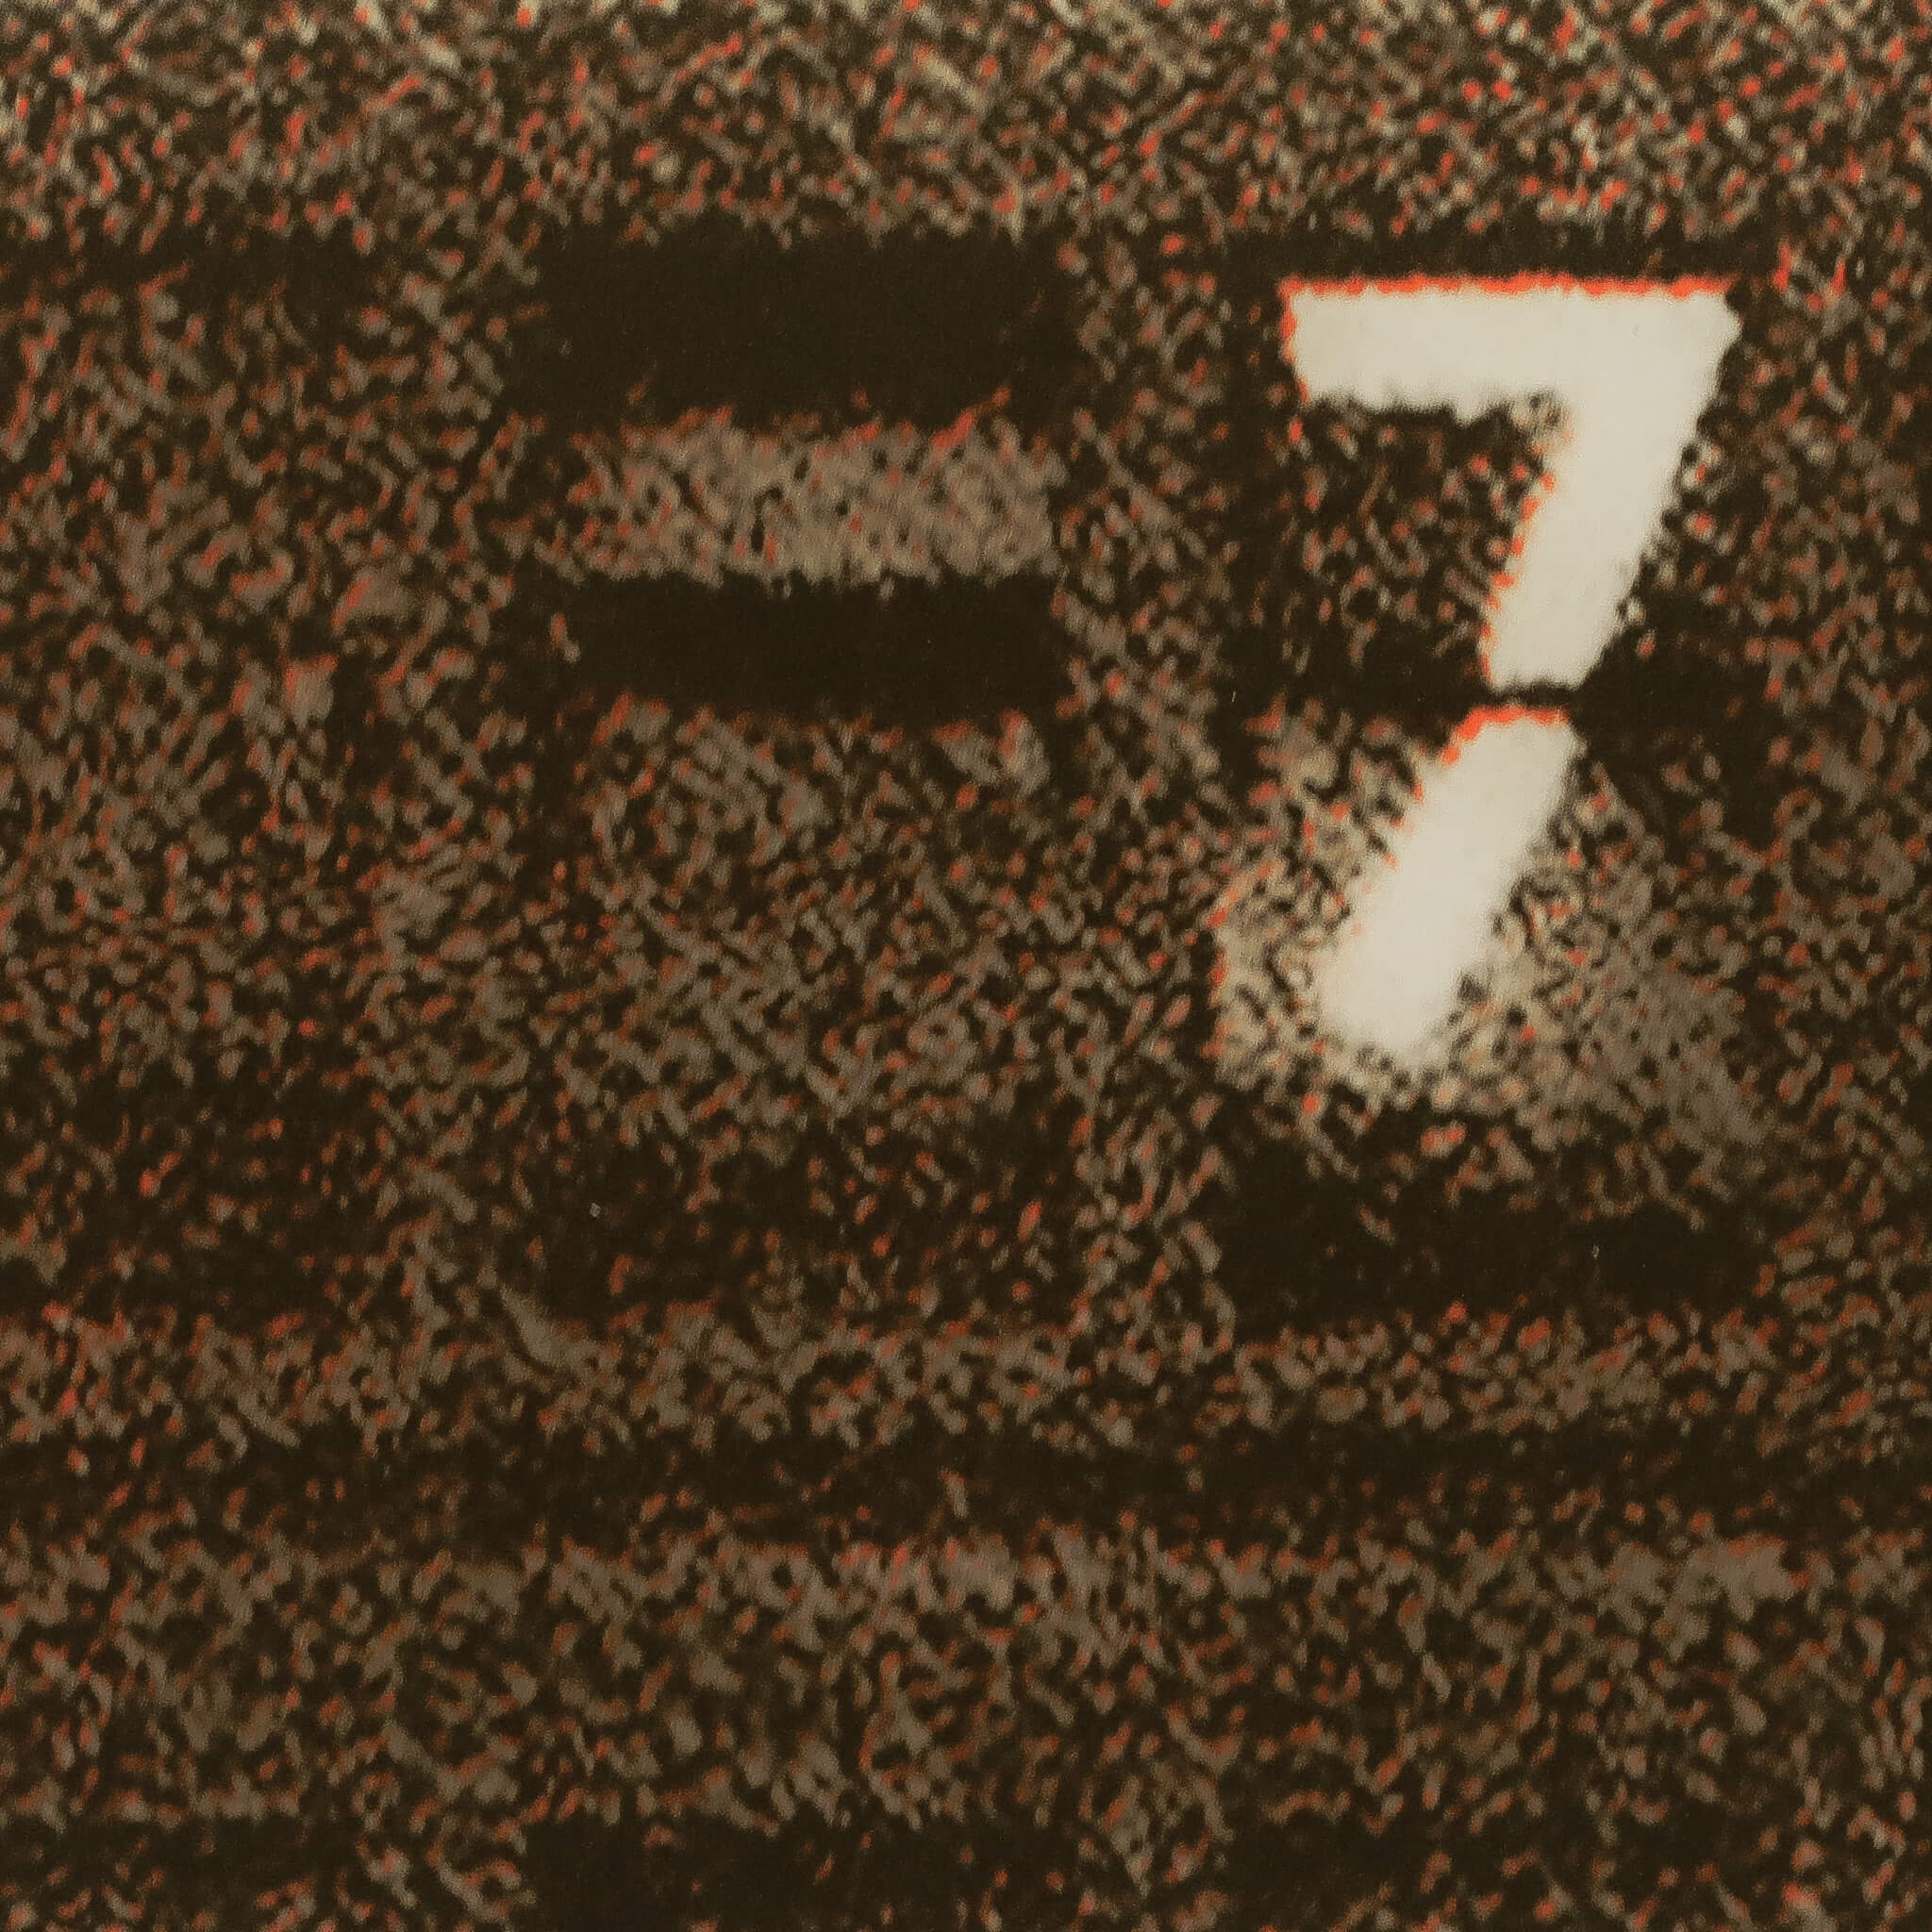 F8A8DA62 60E9 4026 B425 24E86B814FCC - Seven by Lidija Antanasijevic